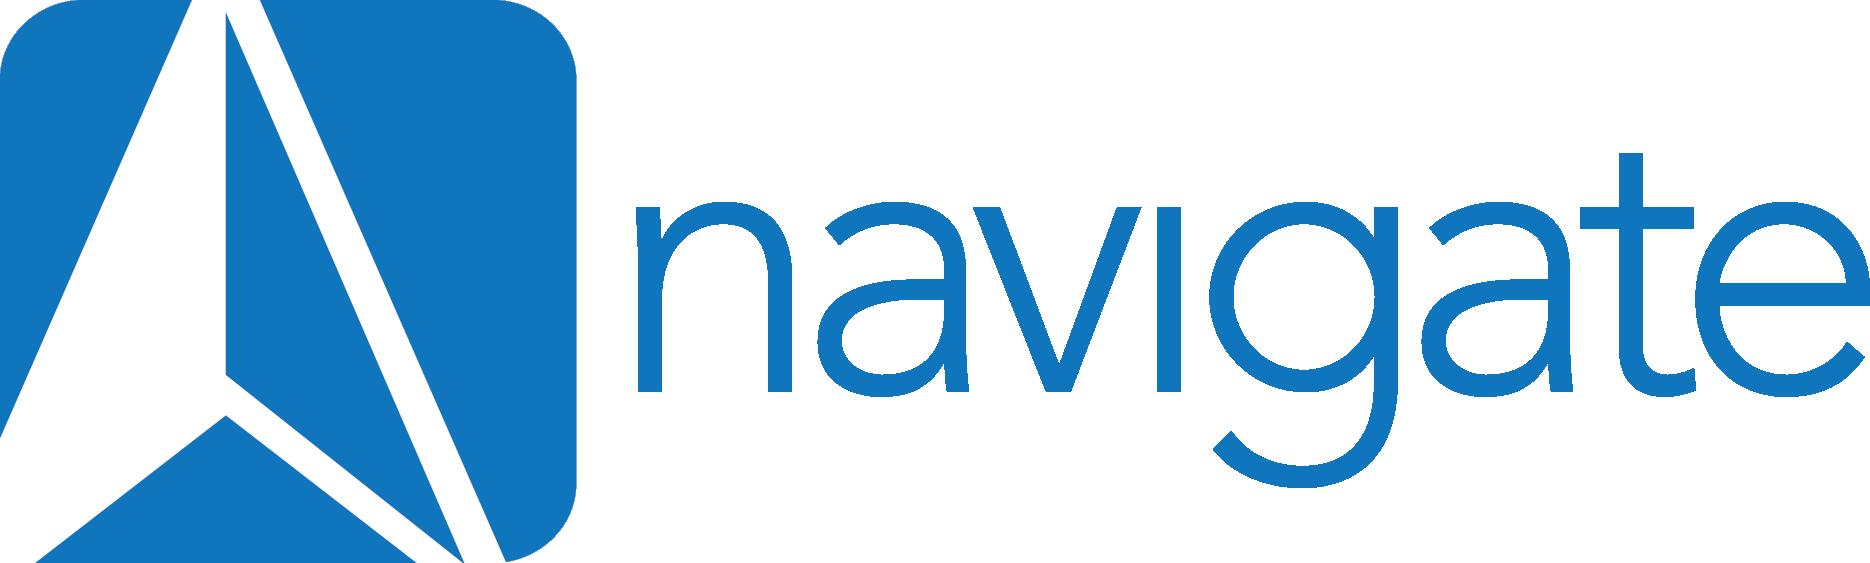 Navigate-horizontal-blue.png